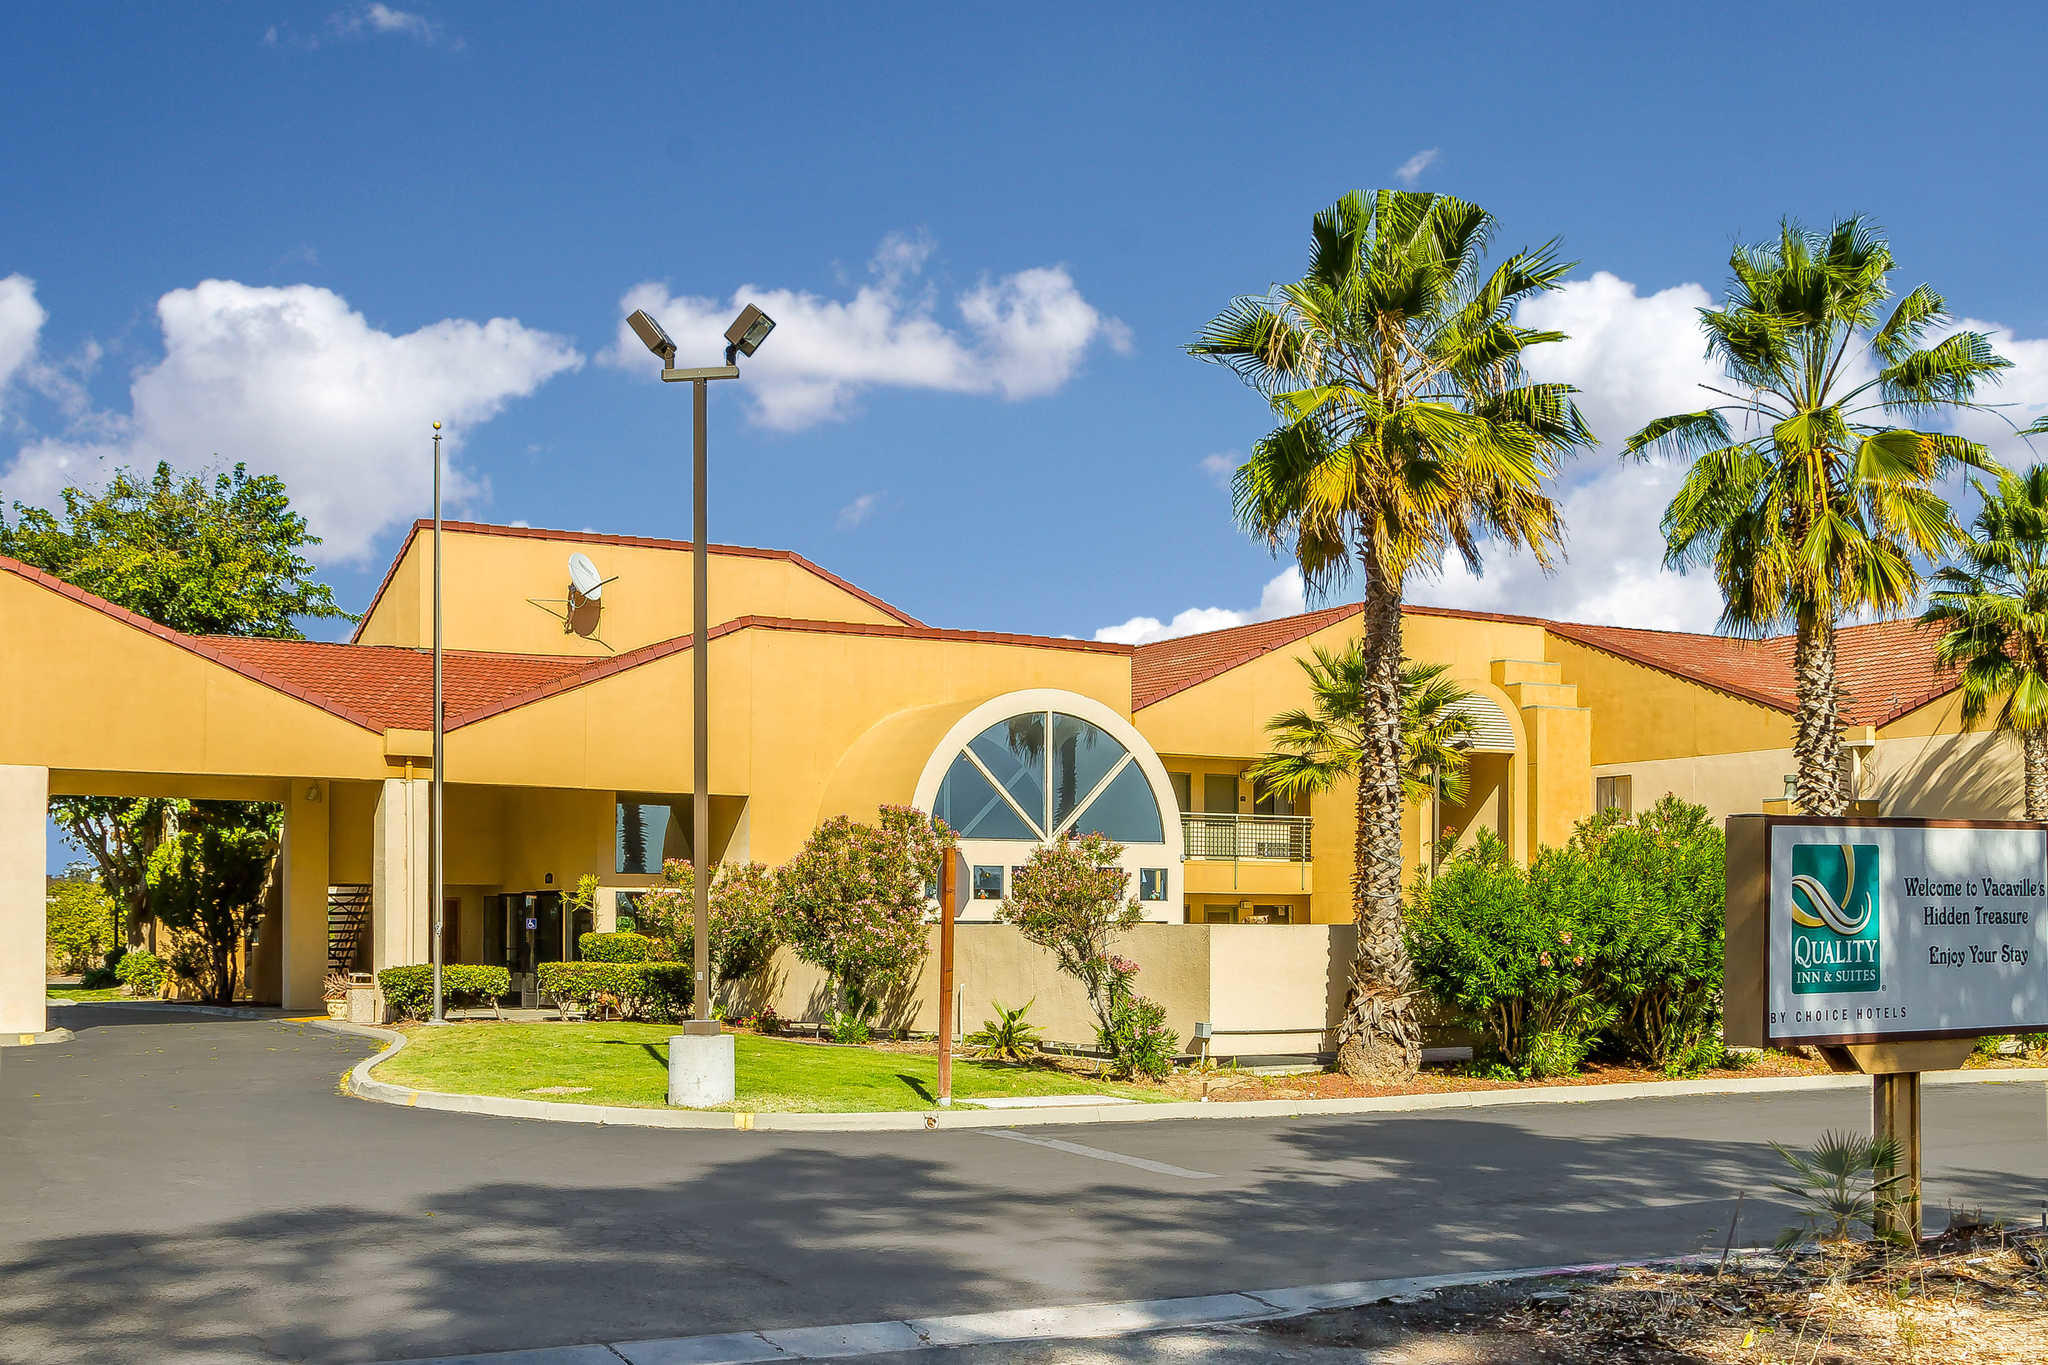 Vacaville Ca Pet Friendly Hotels